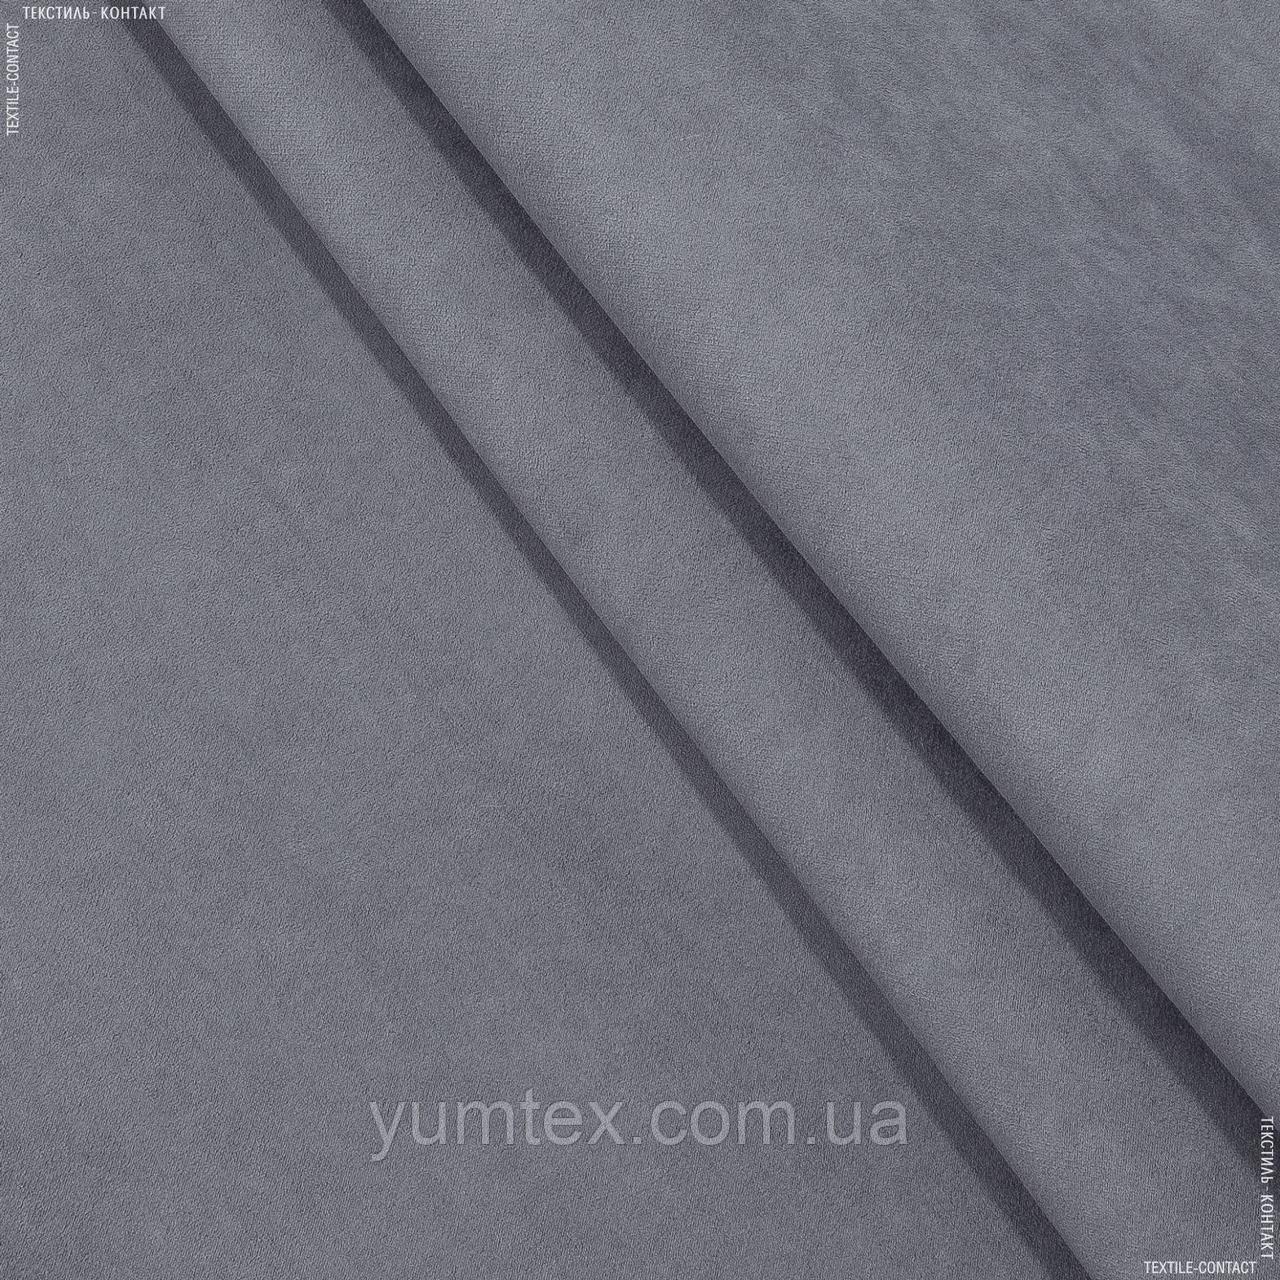 Замша  суэт/suet /т.сизый 141424